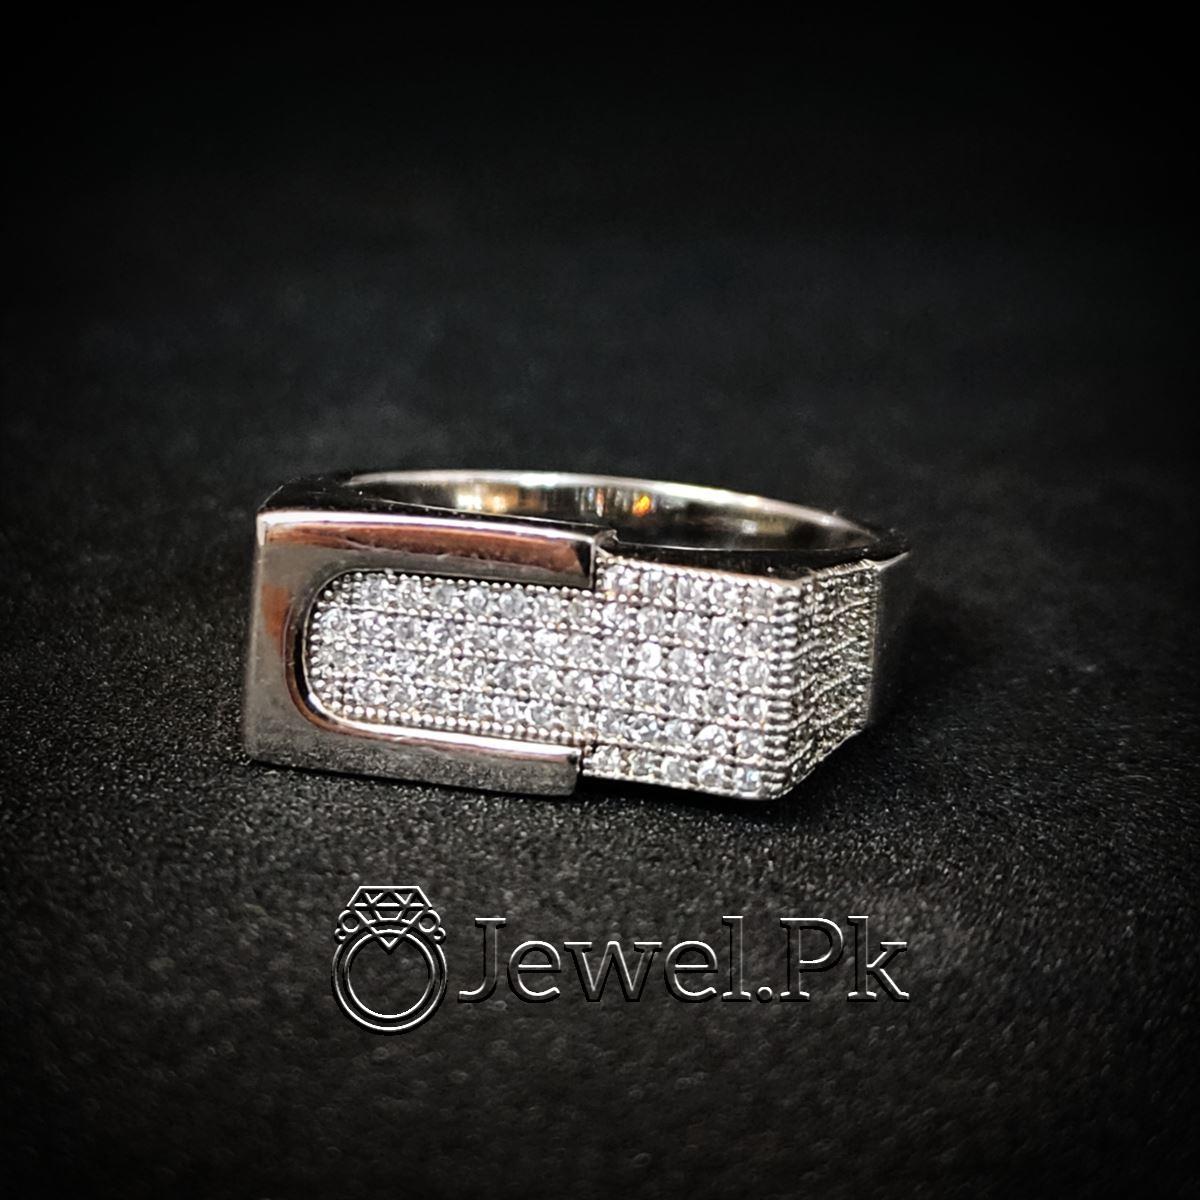 Luxury Italian Rings for men Very Beautiful Italian Zircon Rings for man 9 natural gemstones pakistan + 925 silver jewelry online